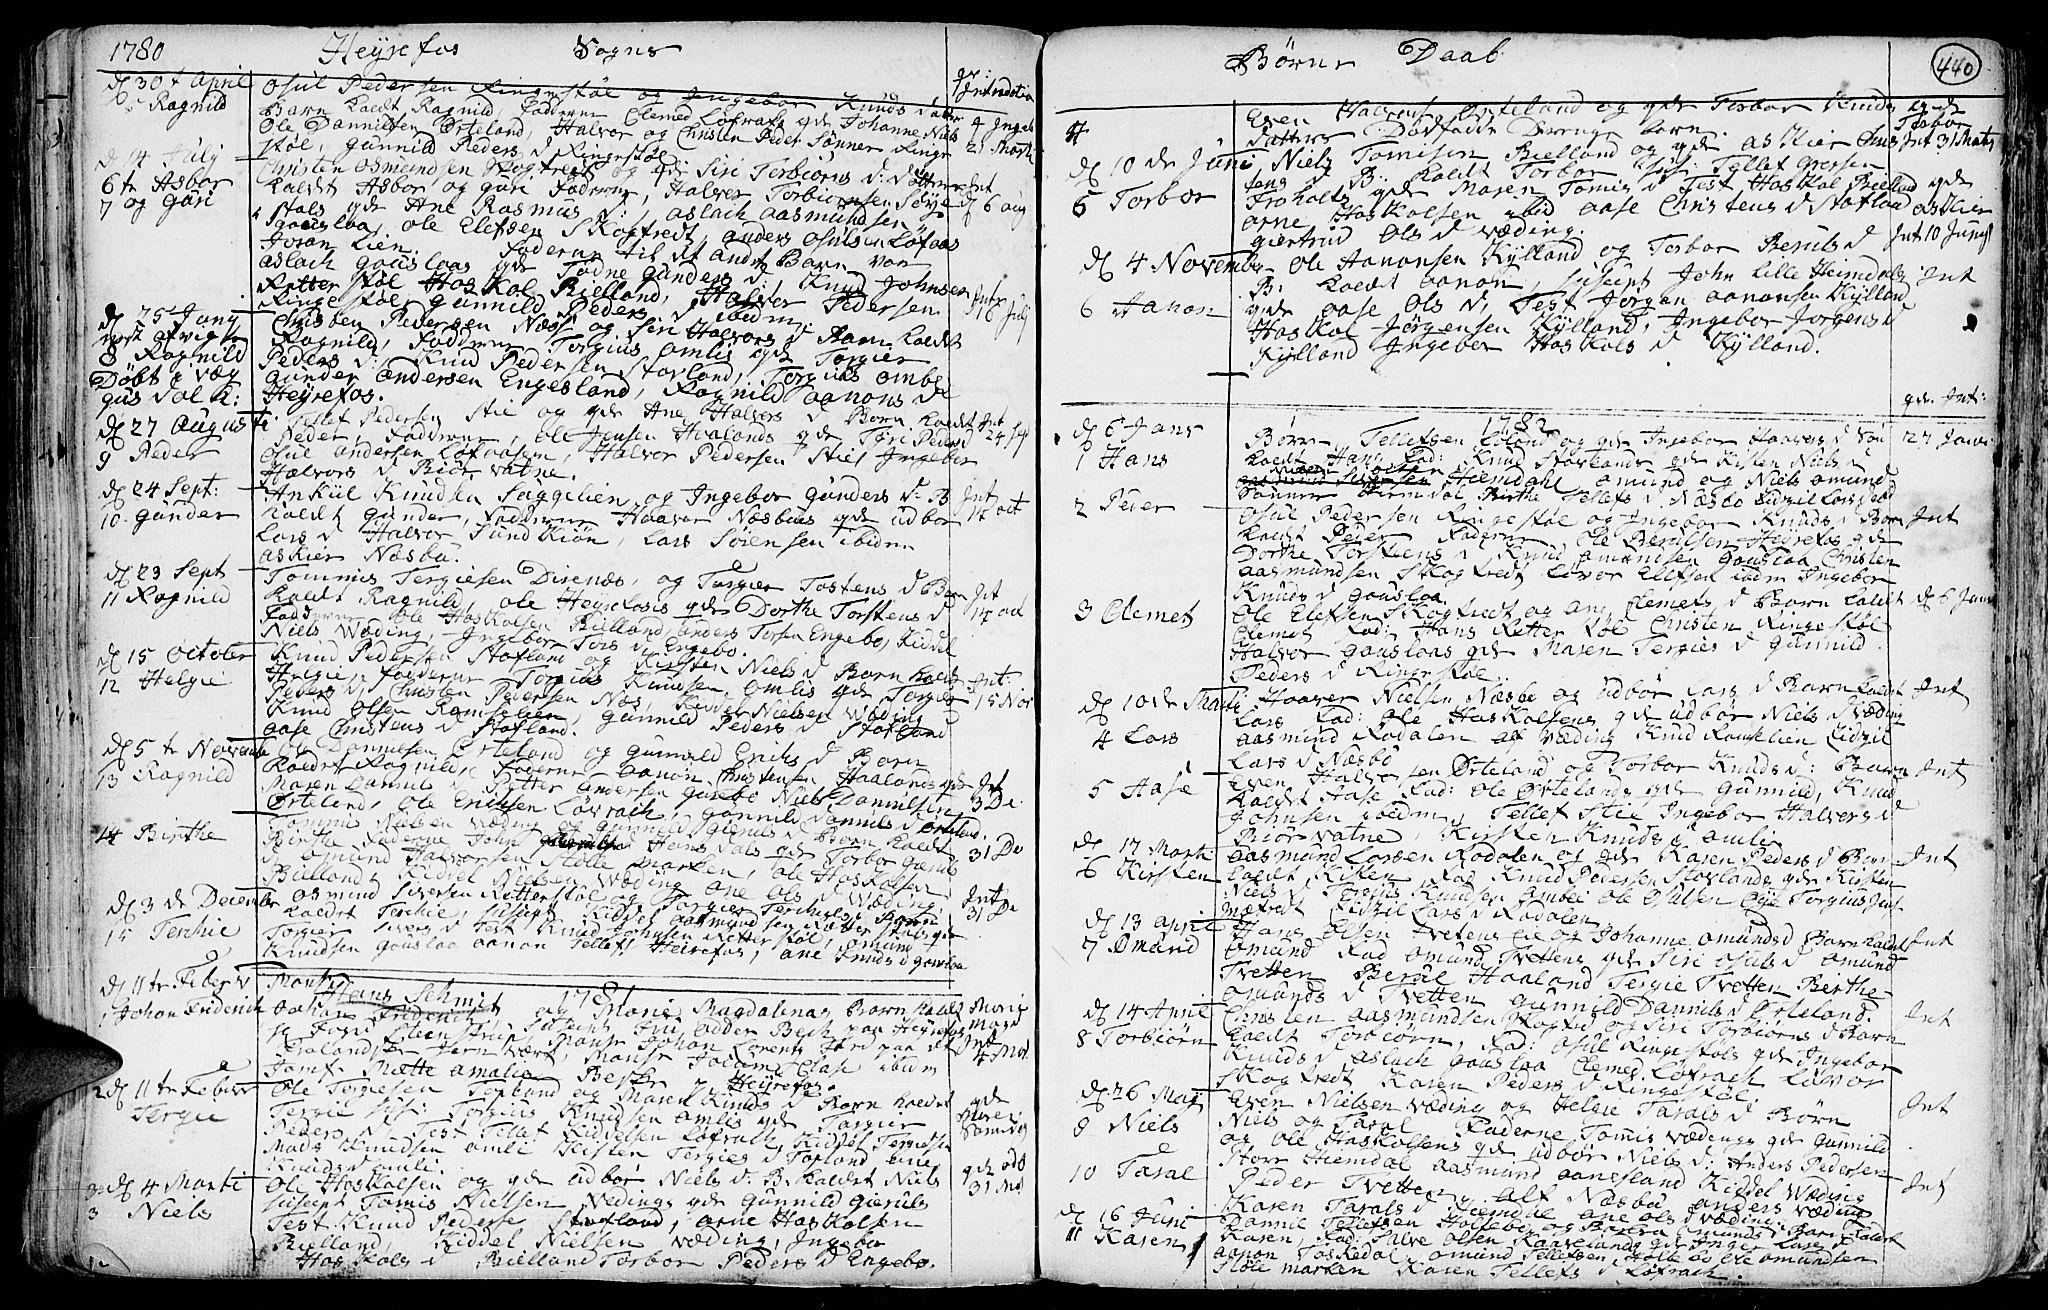 SAK, Hommedal sokneprestkontor, F/Fa/Fab/L0002: Ministerialbok nr. A 2 /3, 1740-1821, s. 440